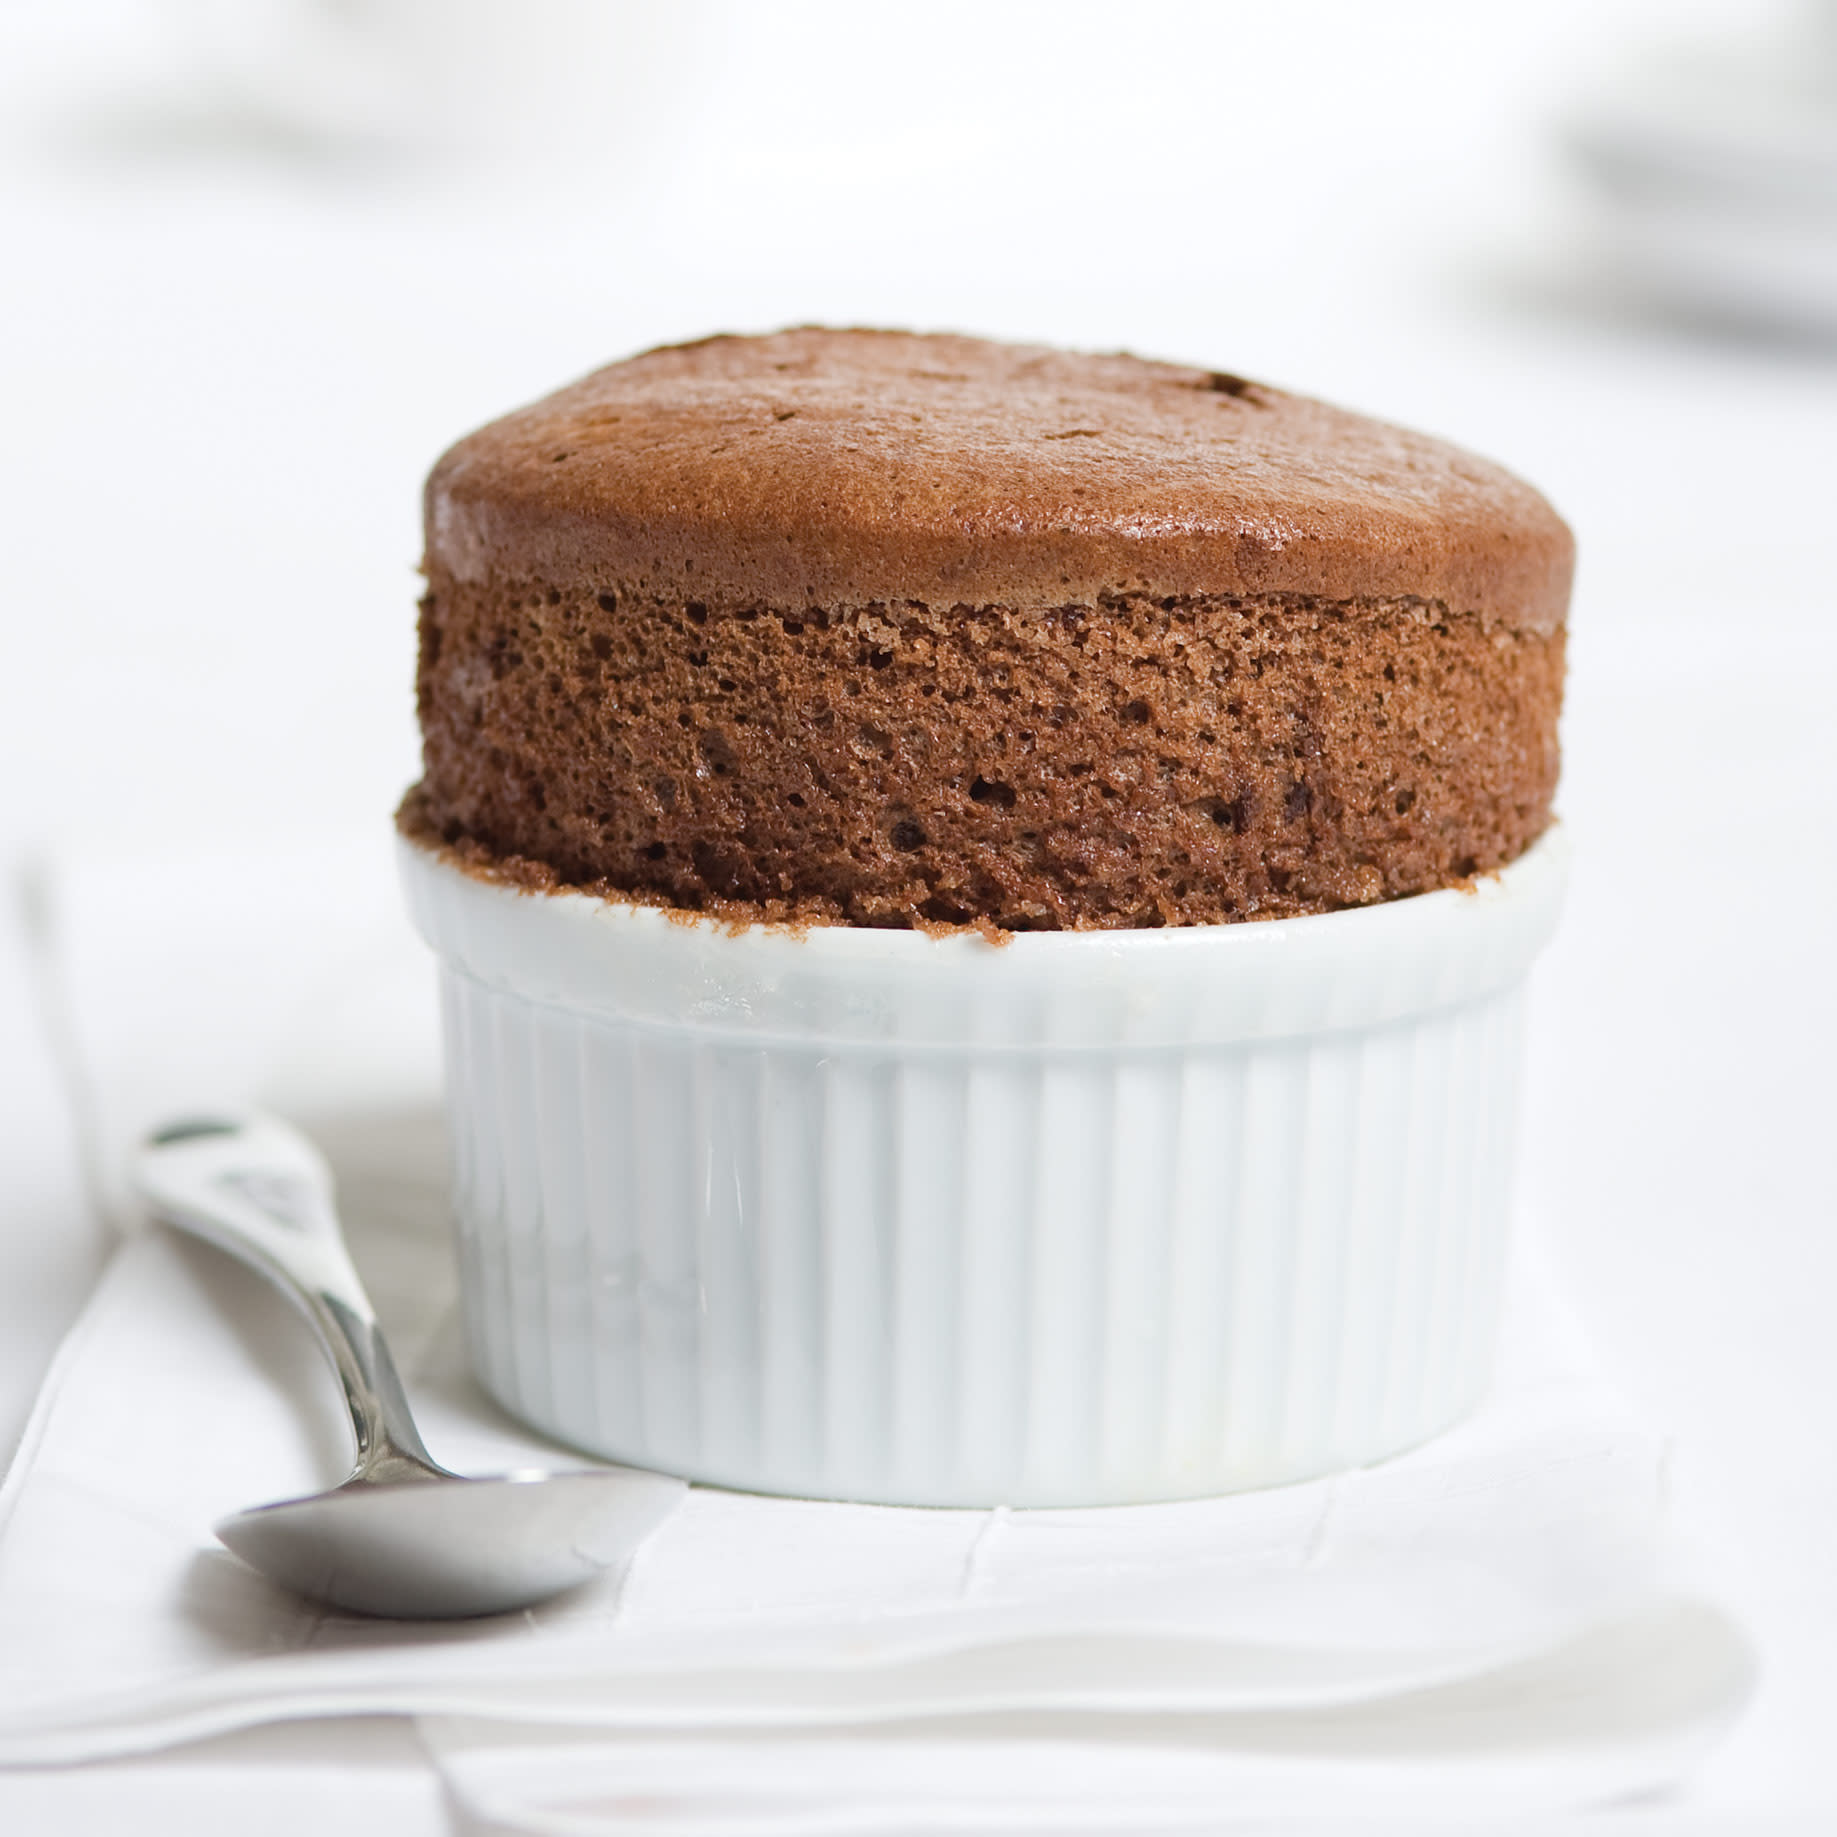 Make-Ahead Chocolate Souffle | America's Test Kitchen